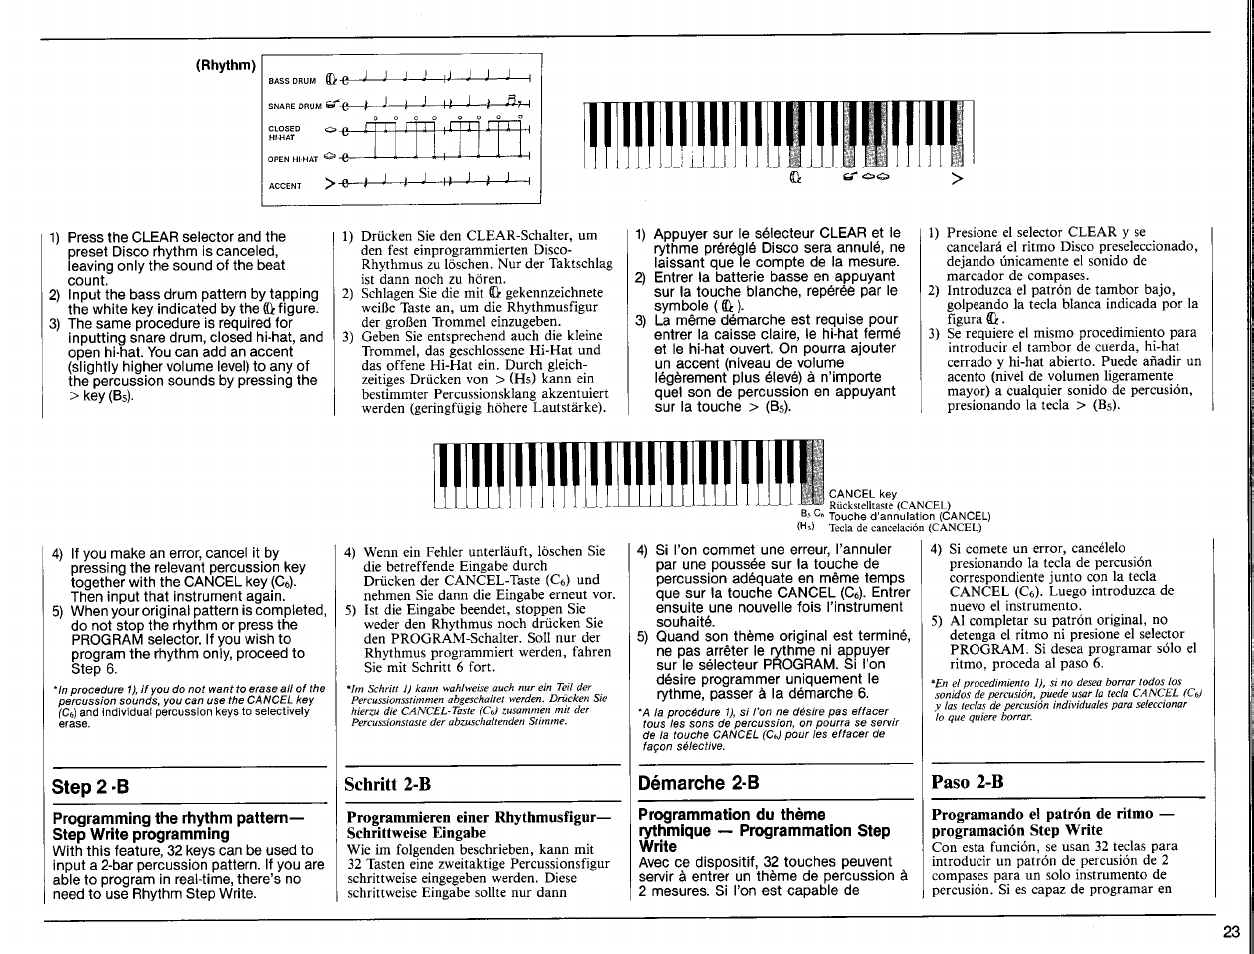 rhythm step 2 b d marche 2 b yamaha psr 6300 user manual rh manualsdir com Kindle Fire User Guide User Guide Template